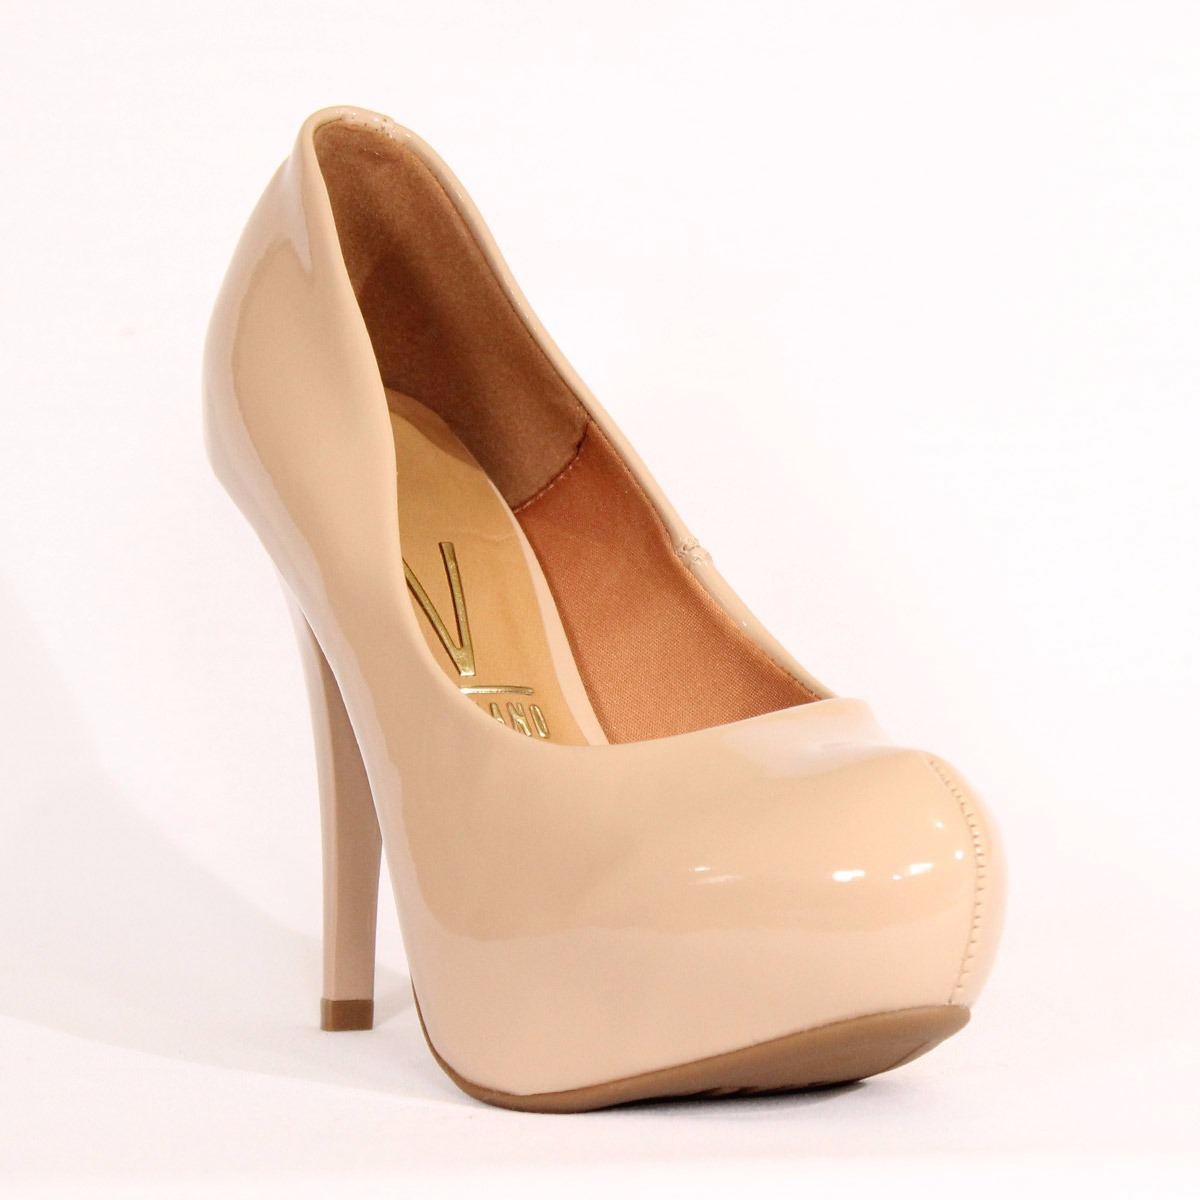 fb1cc52854 sapato scarpin salto agulha meia pata nude - vizzano. Carregando zoom.